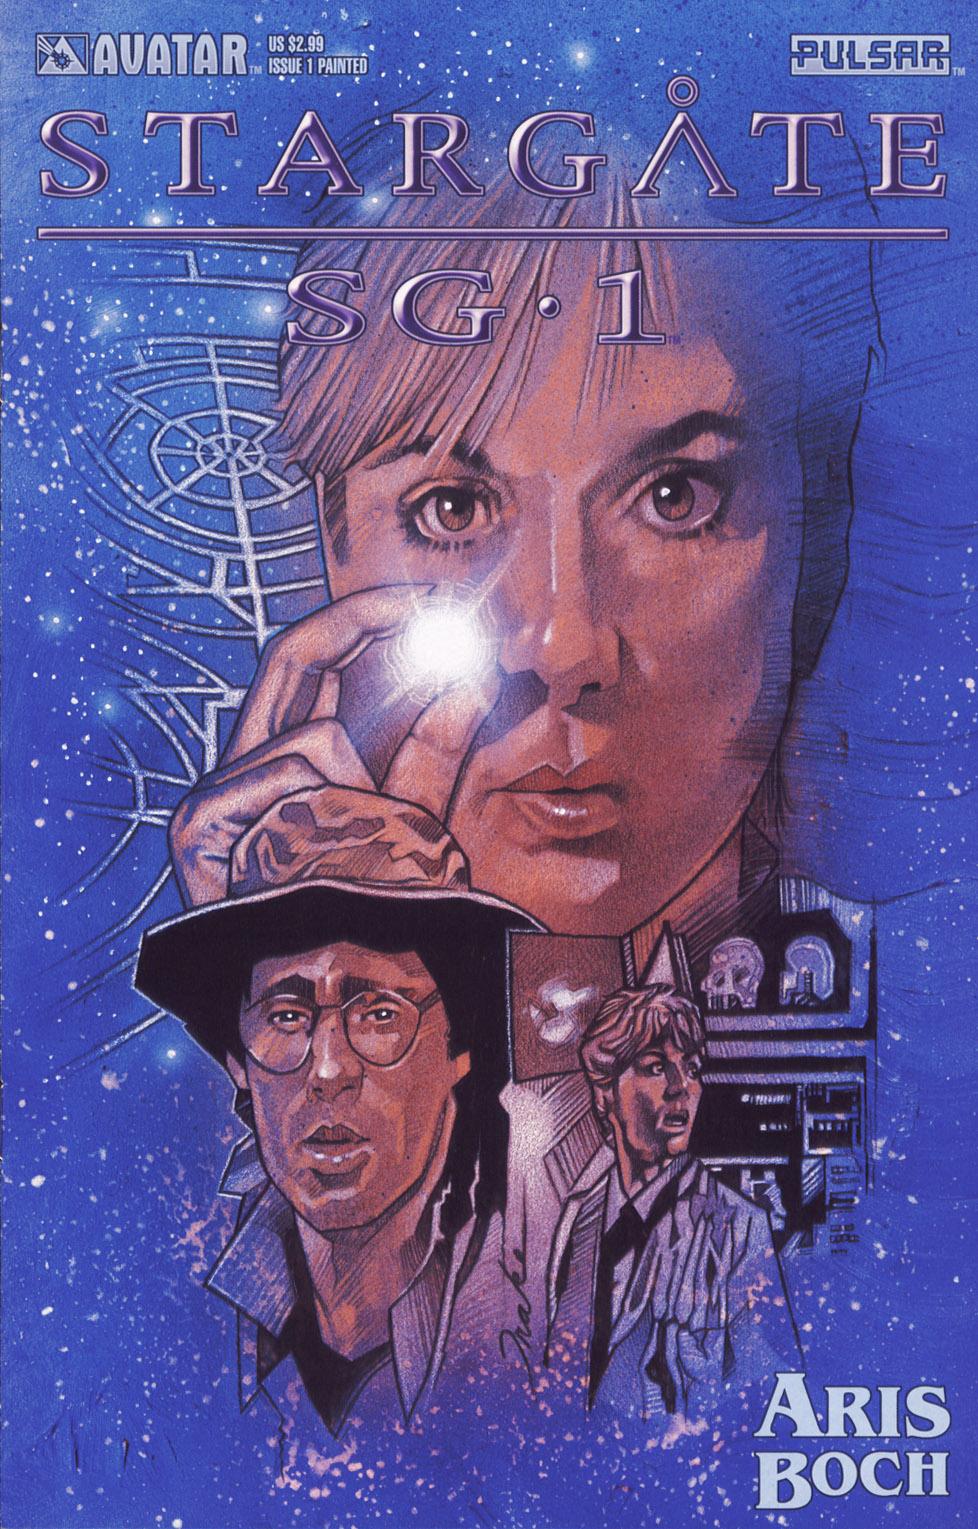 Stargate SG-1: Aris Boch Full Page 1